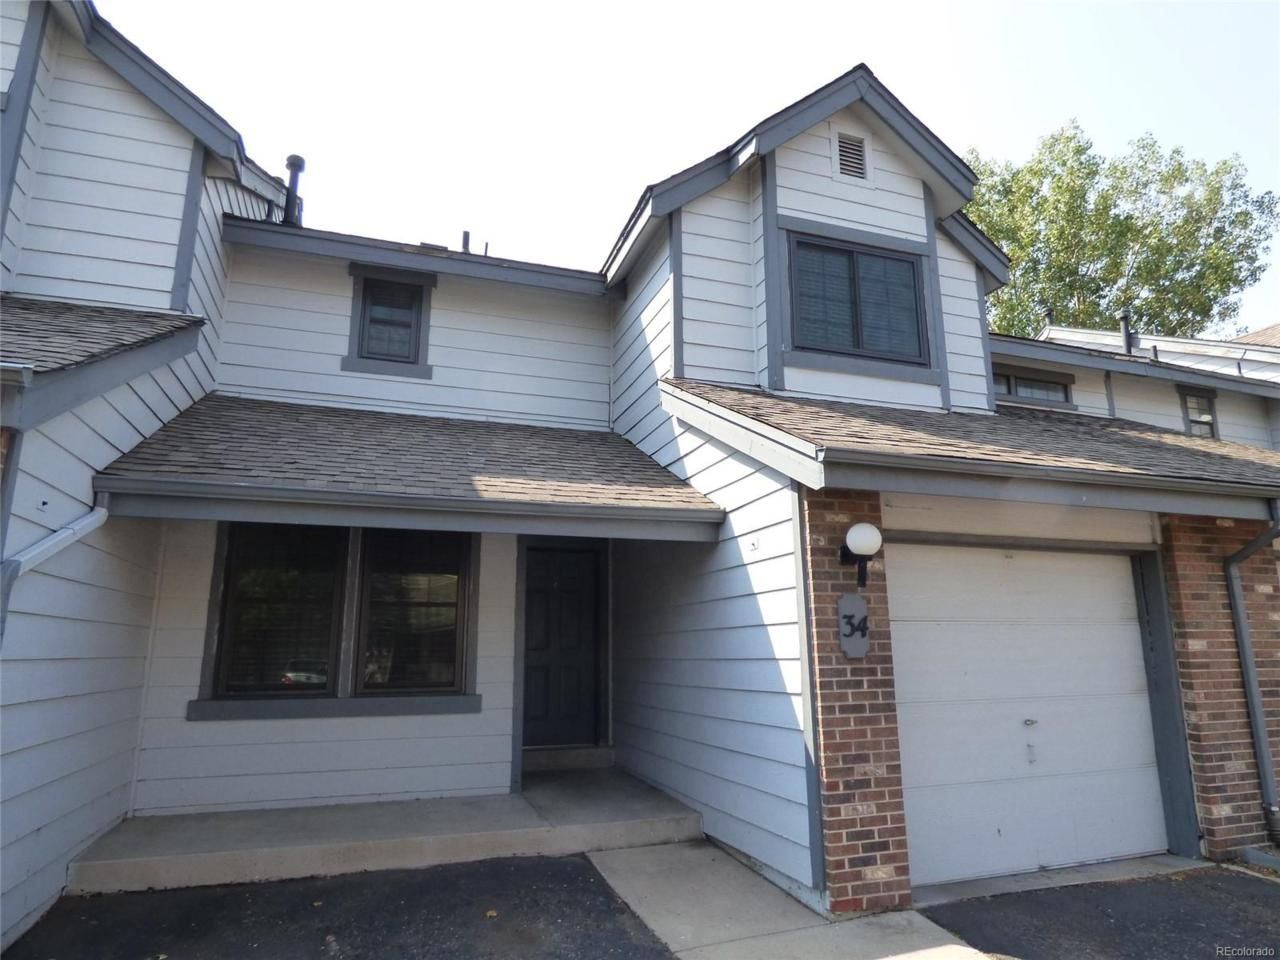 10842 W Evans Avenue #34, Lakewood, CO 80227 (MLS #5025952) :: 8z Real Estate